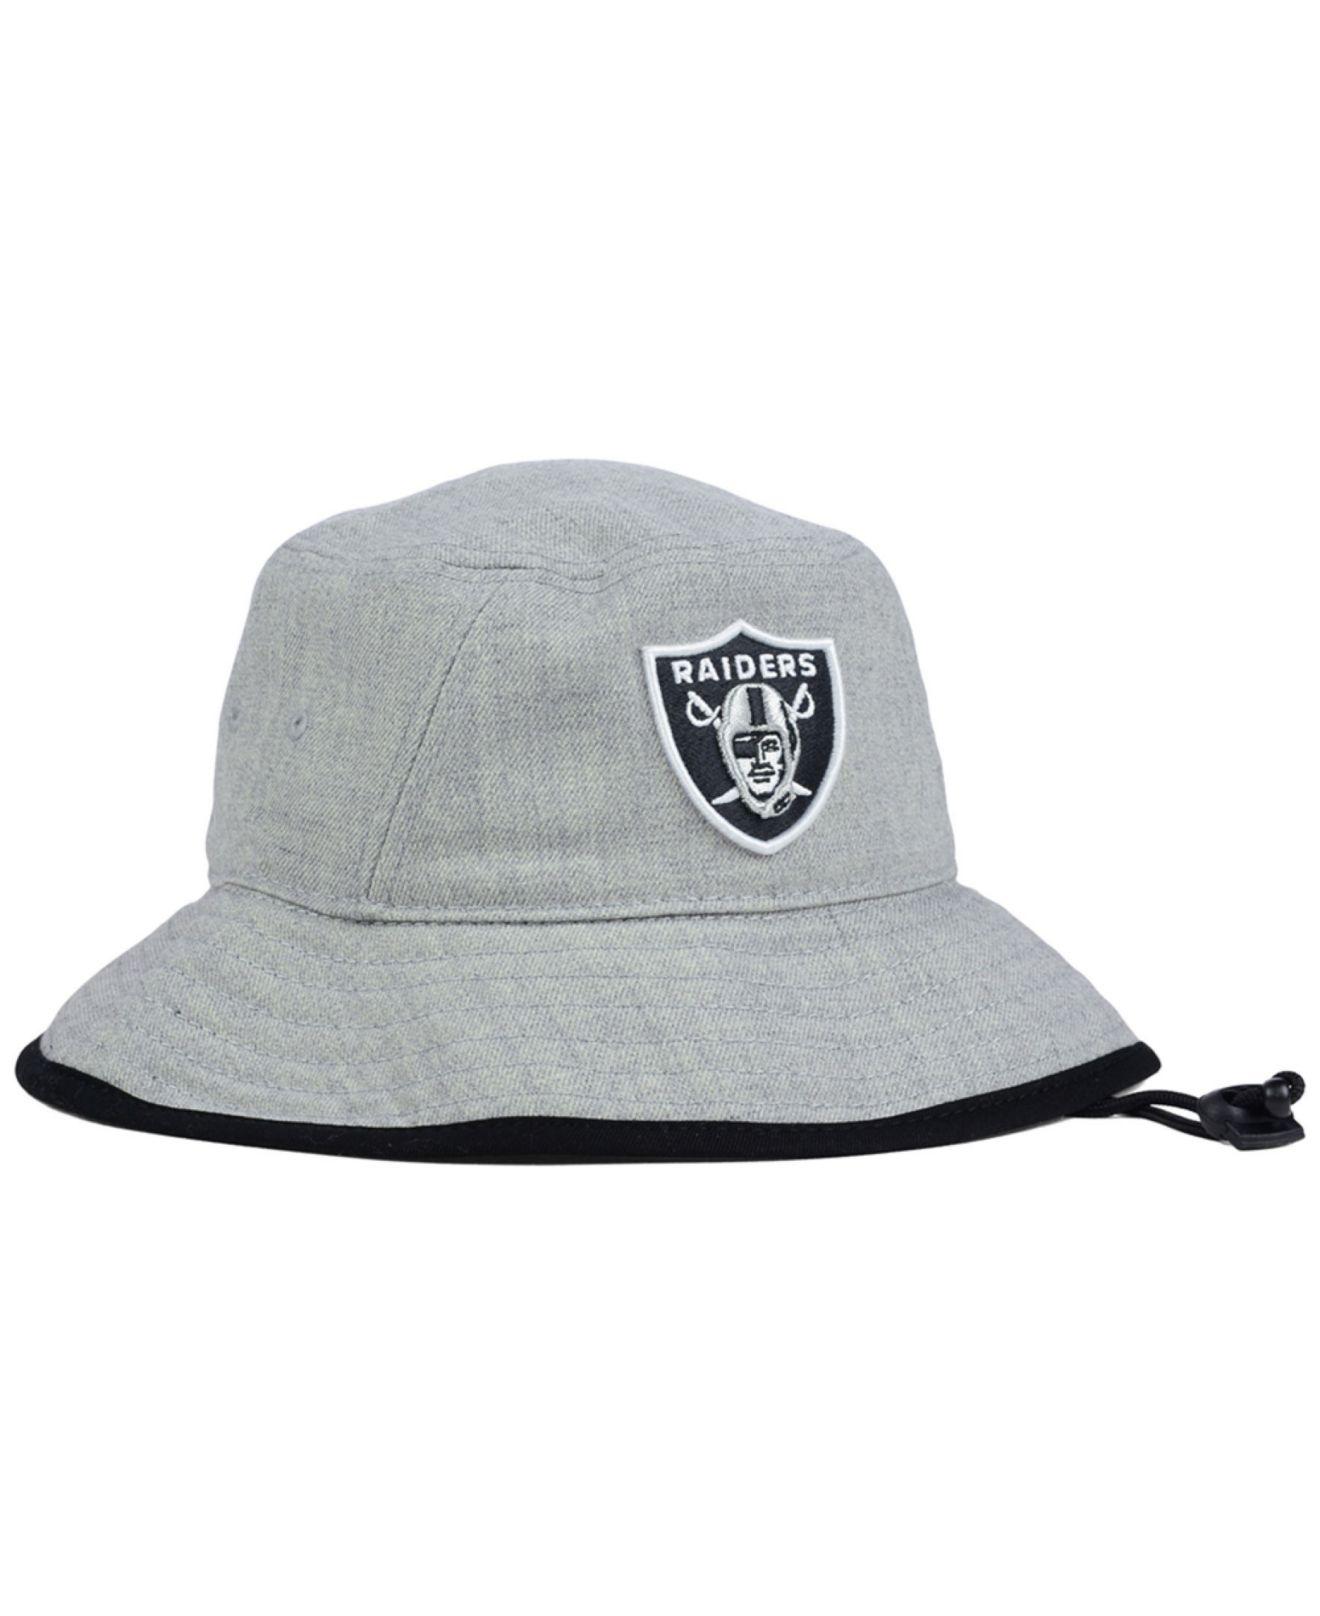 c984ddf07ff ... cheapest lyst ktz oakland raiders nfl heather gray bucket hat in gray  892a0 ce287